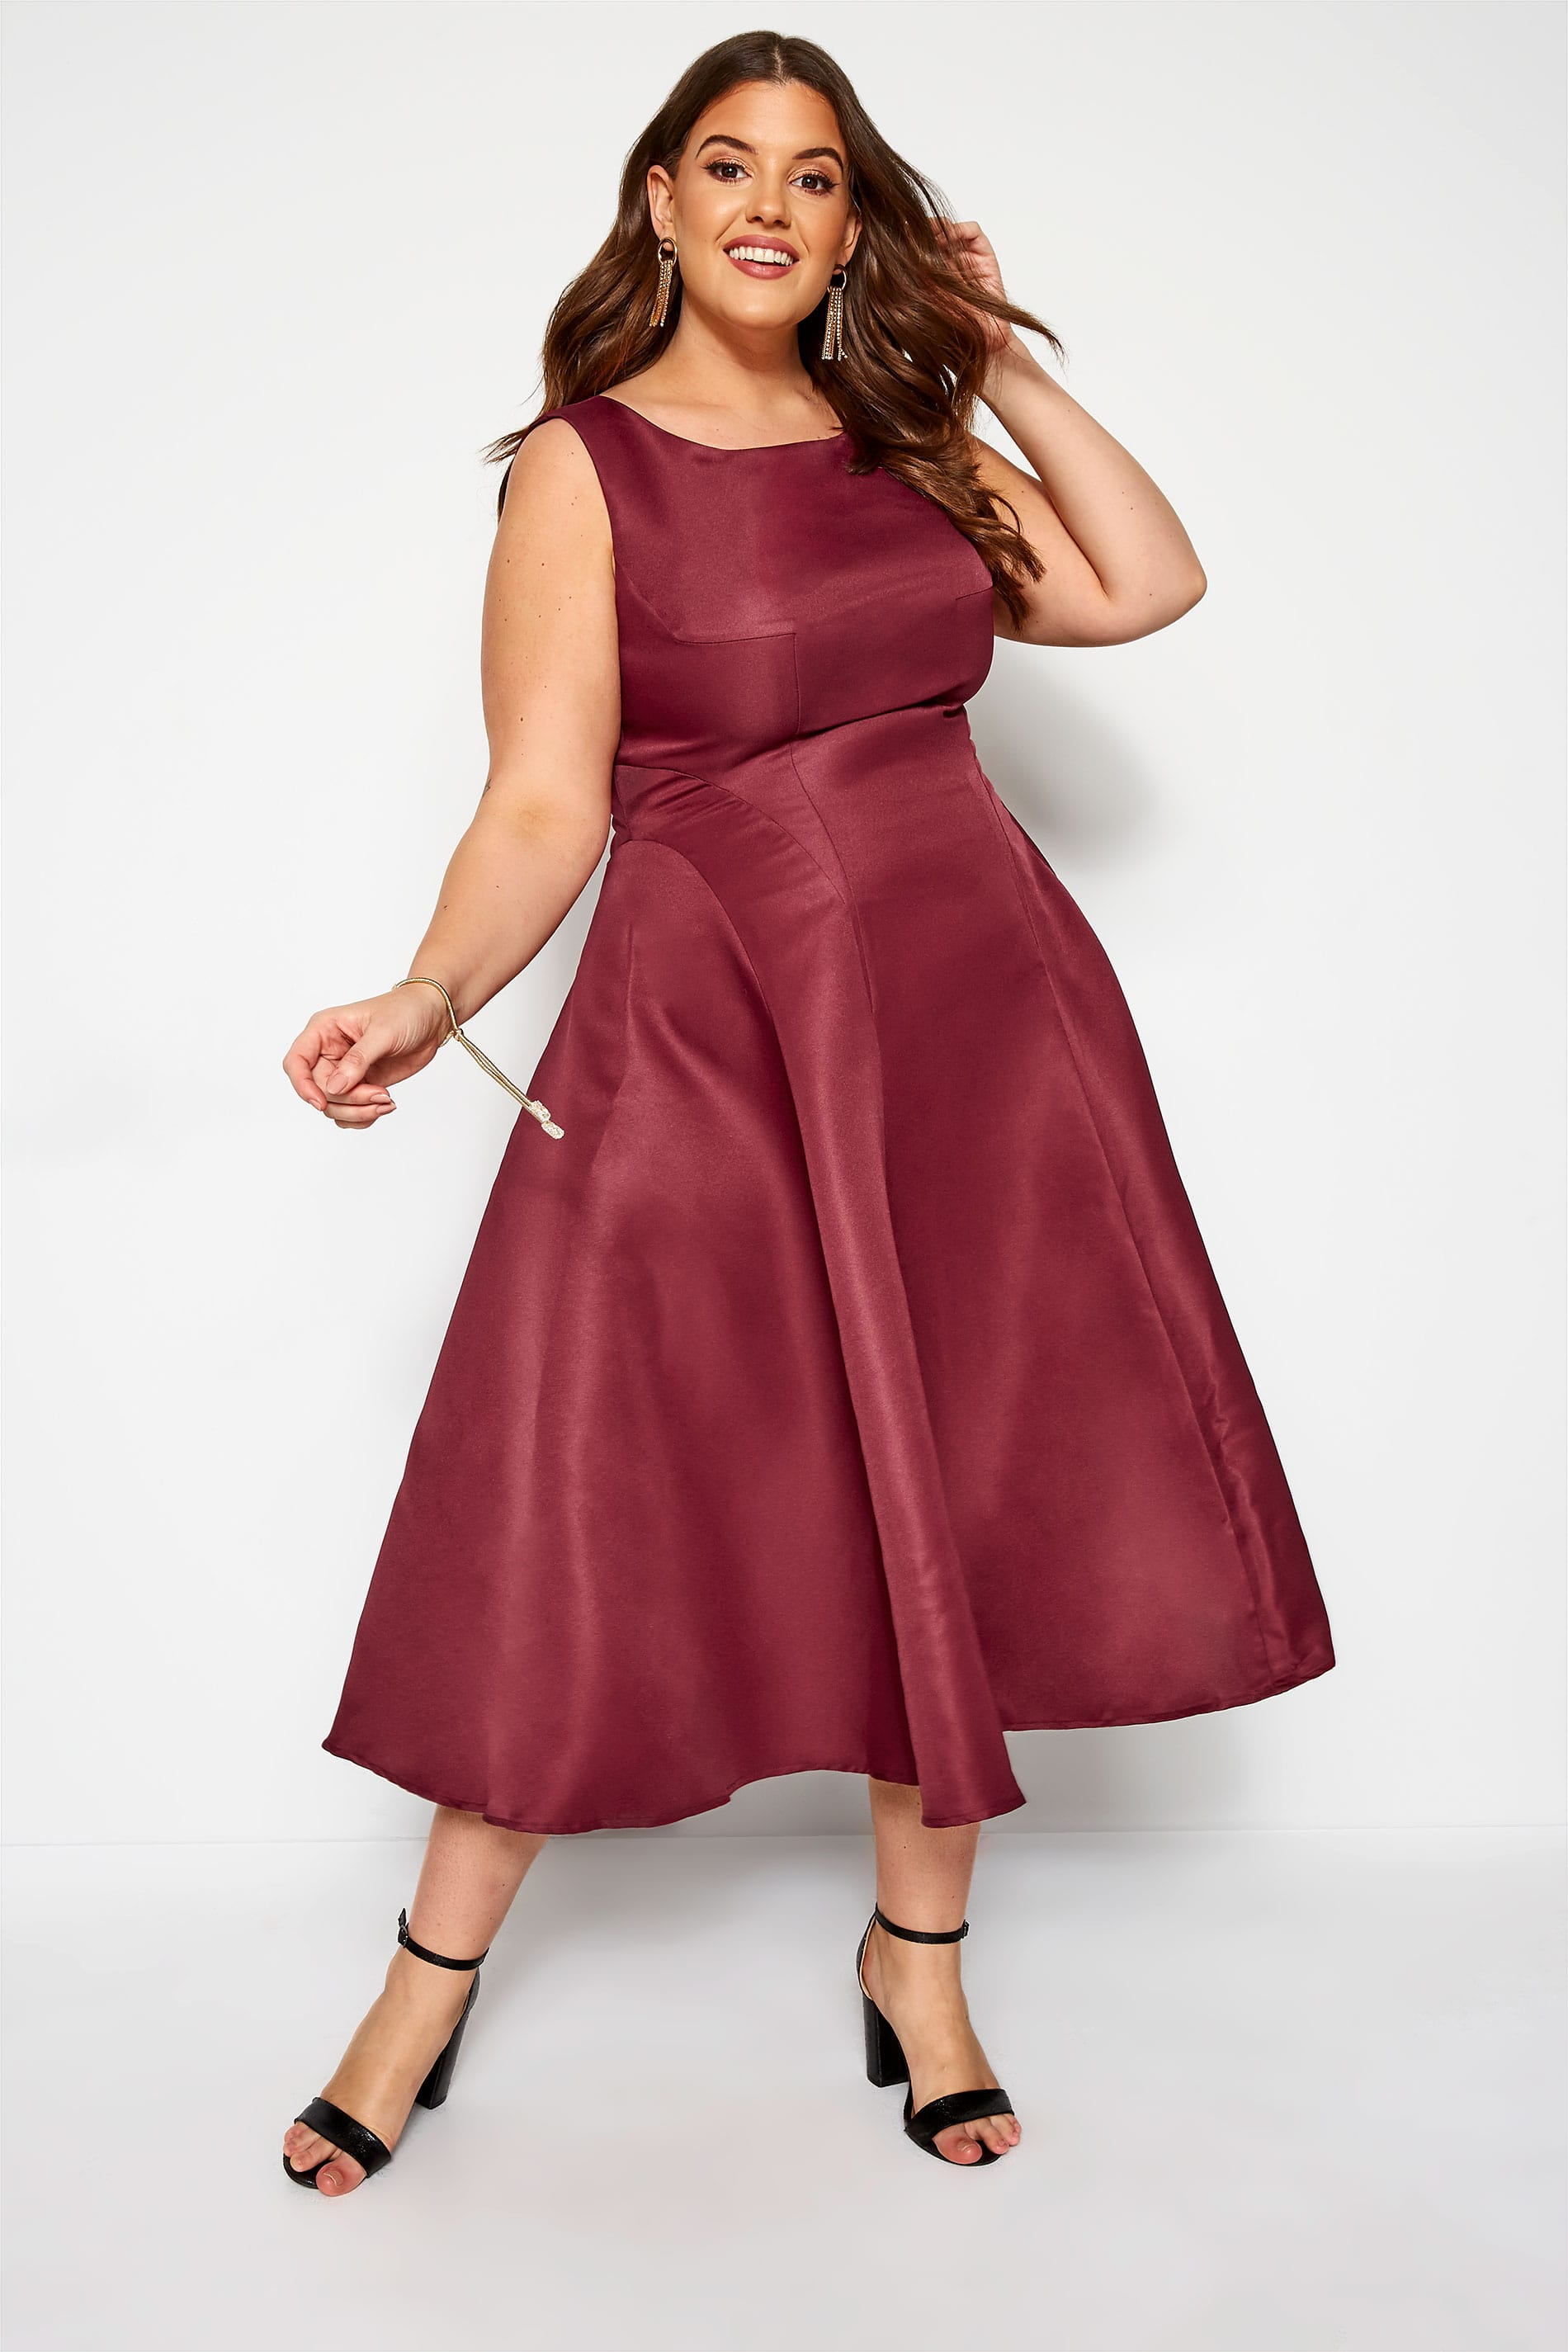 CHI CHI Burgundy Midi Prom Dress